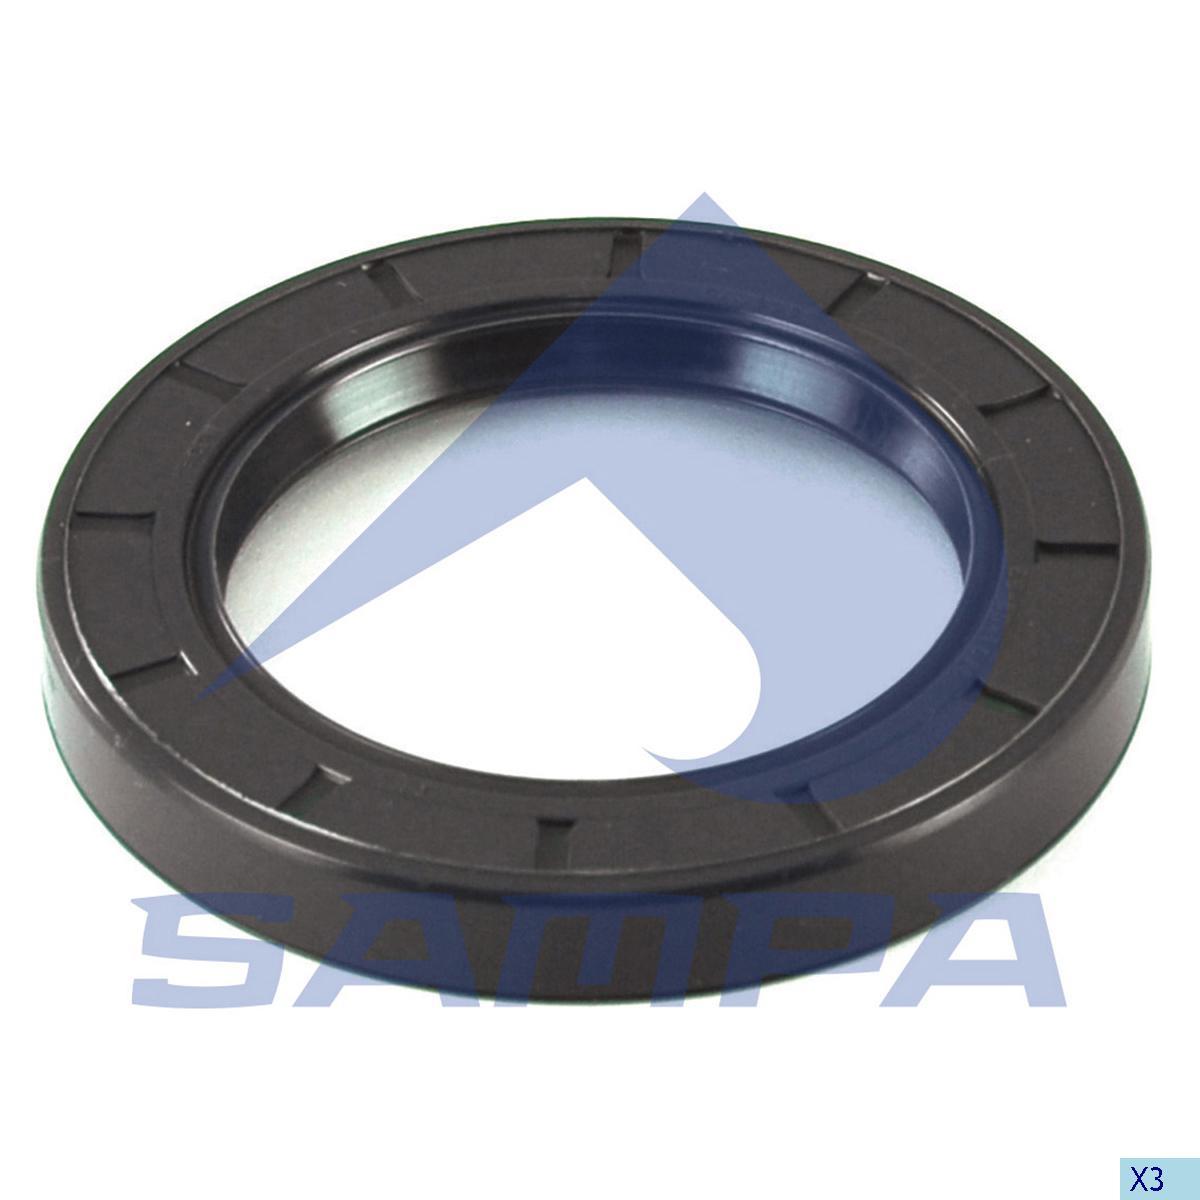 Seal Ring, Power Take Off, R.V.I., Gear Box